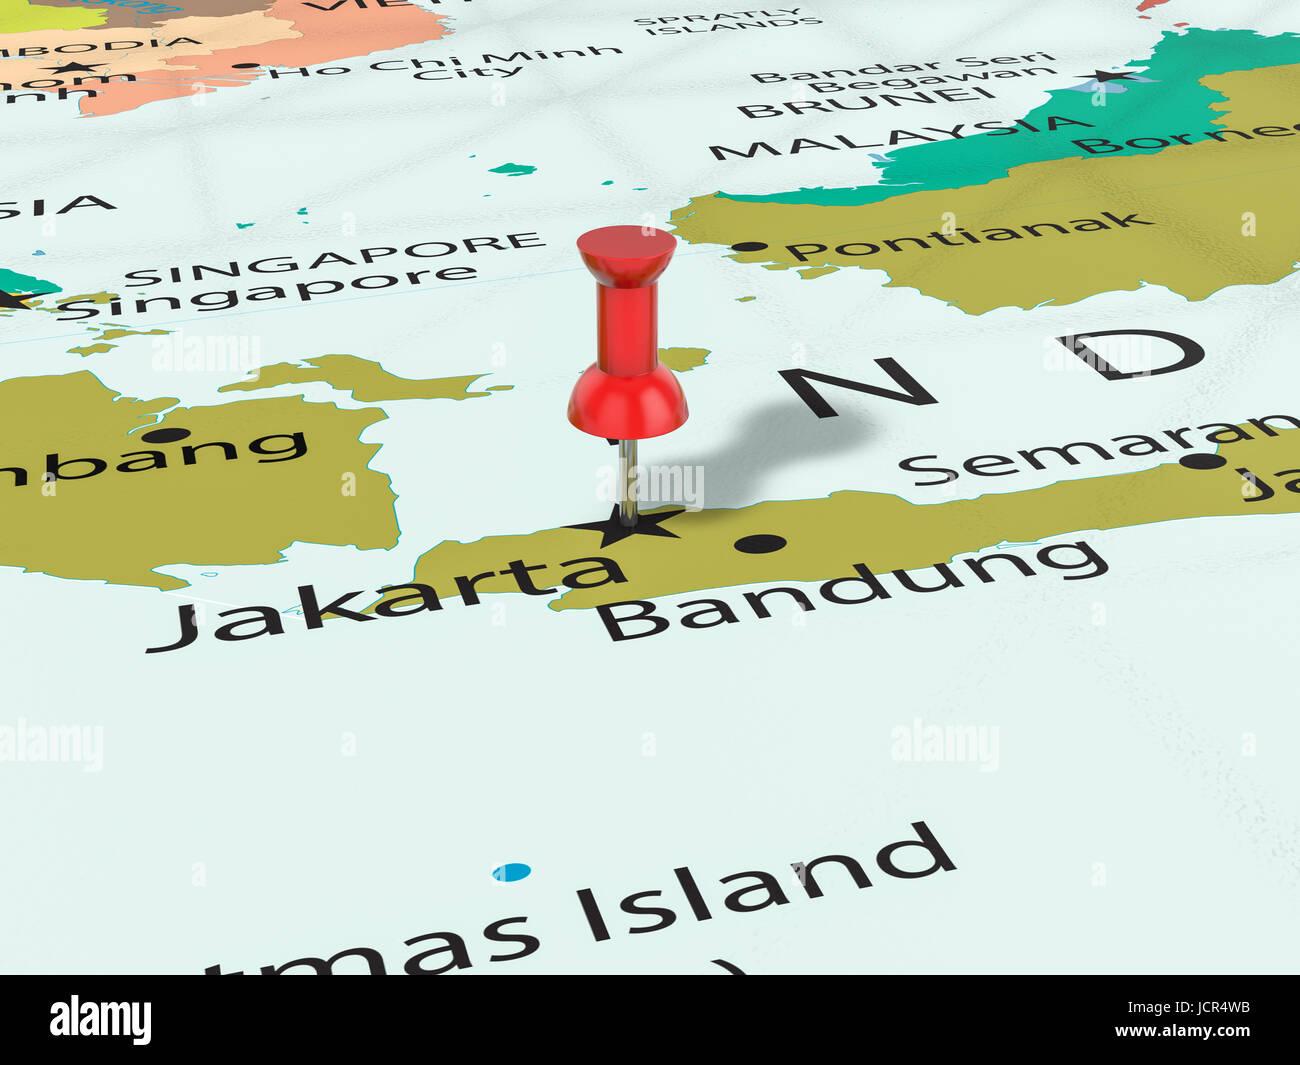 Map Of Asia Jakarta.Jakarta Pinned On Map Asia Stock Photos Jakarta Pinned On Map Asia